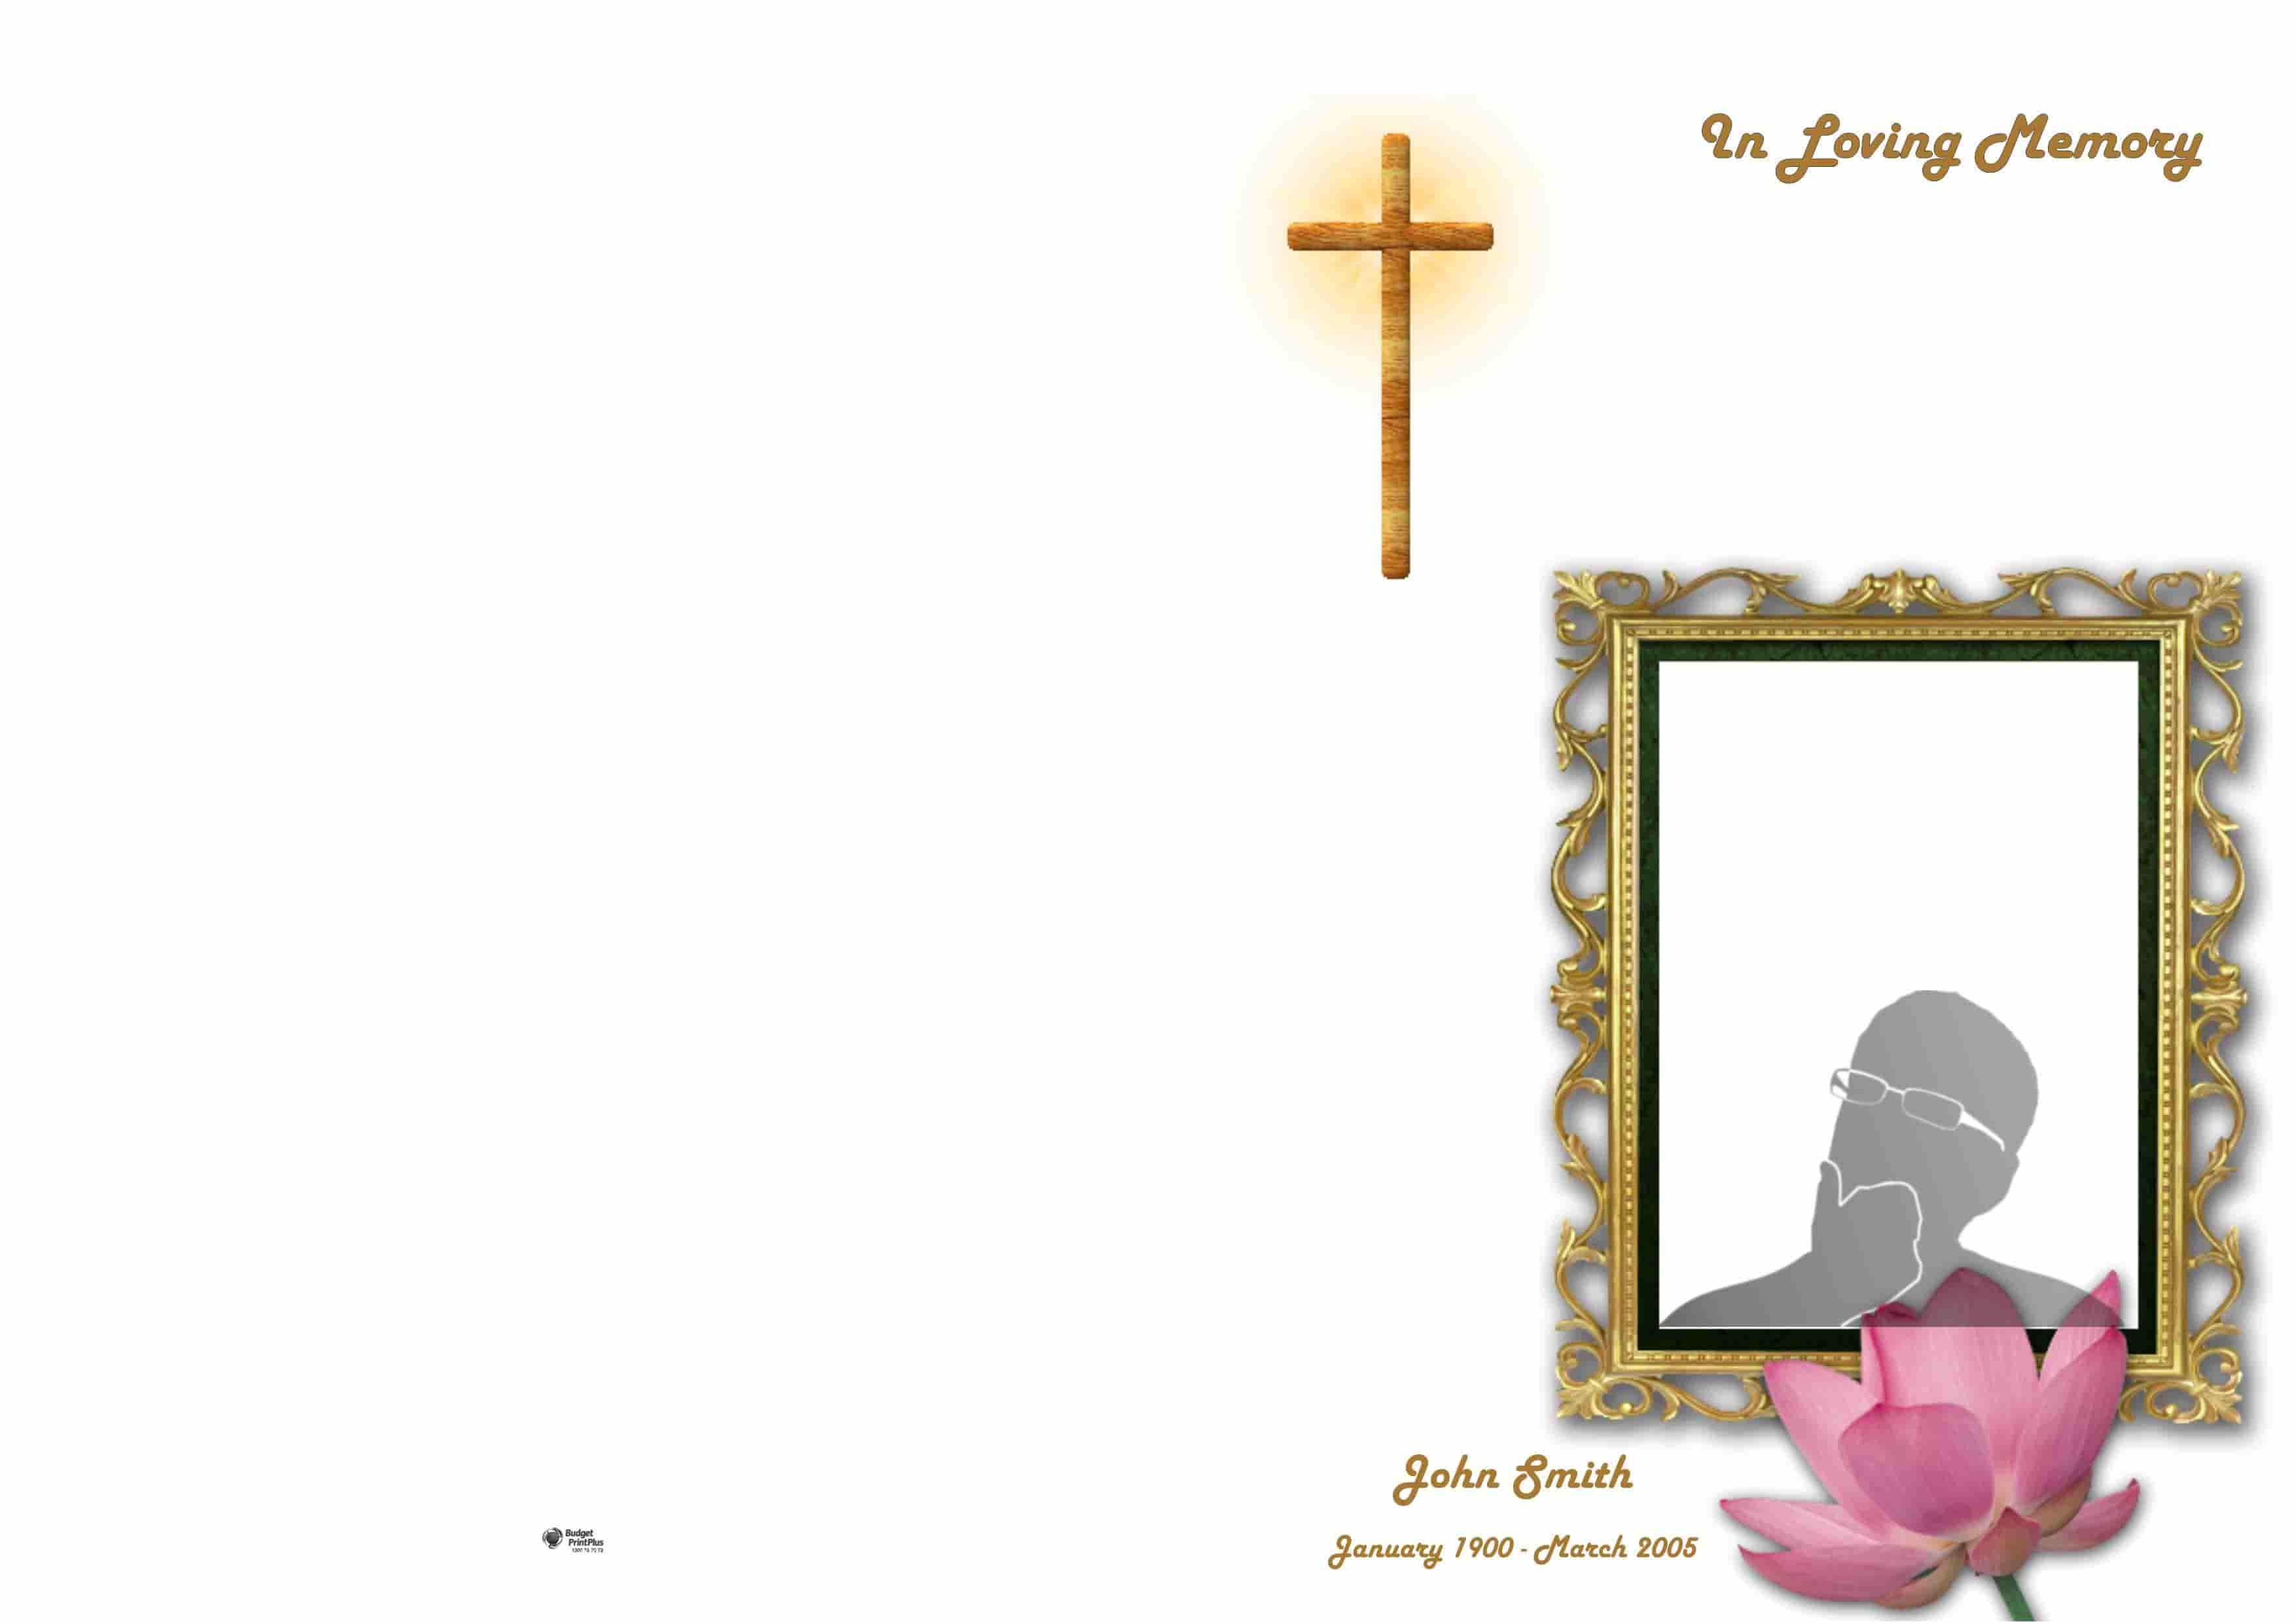 Order Of Service Booklet, Hymn Book, Funeral Program 327